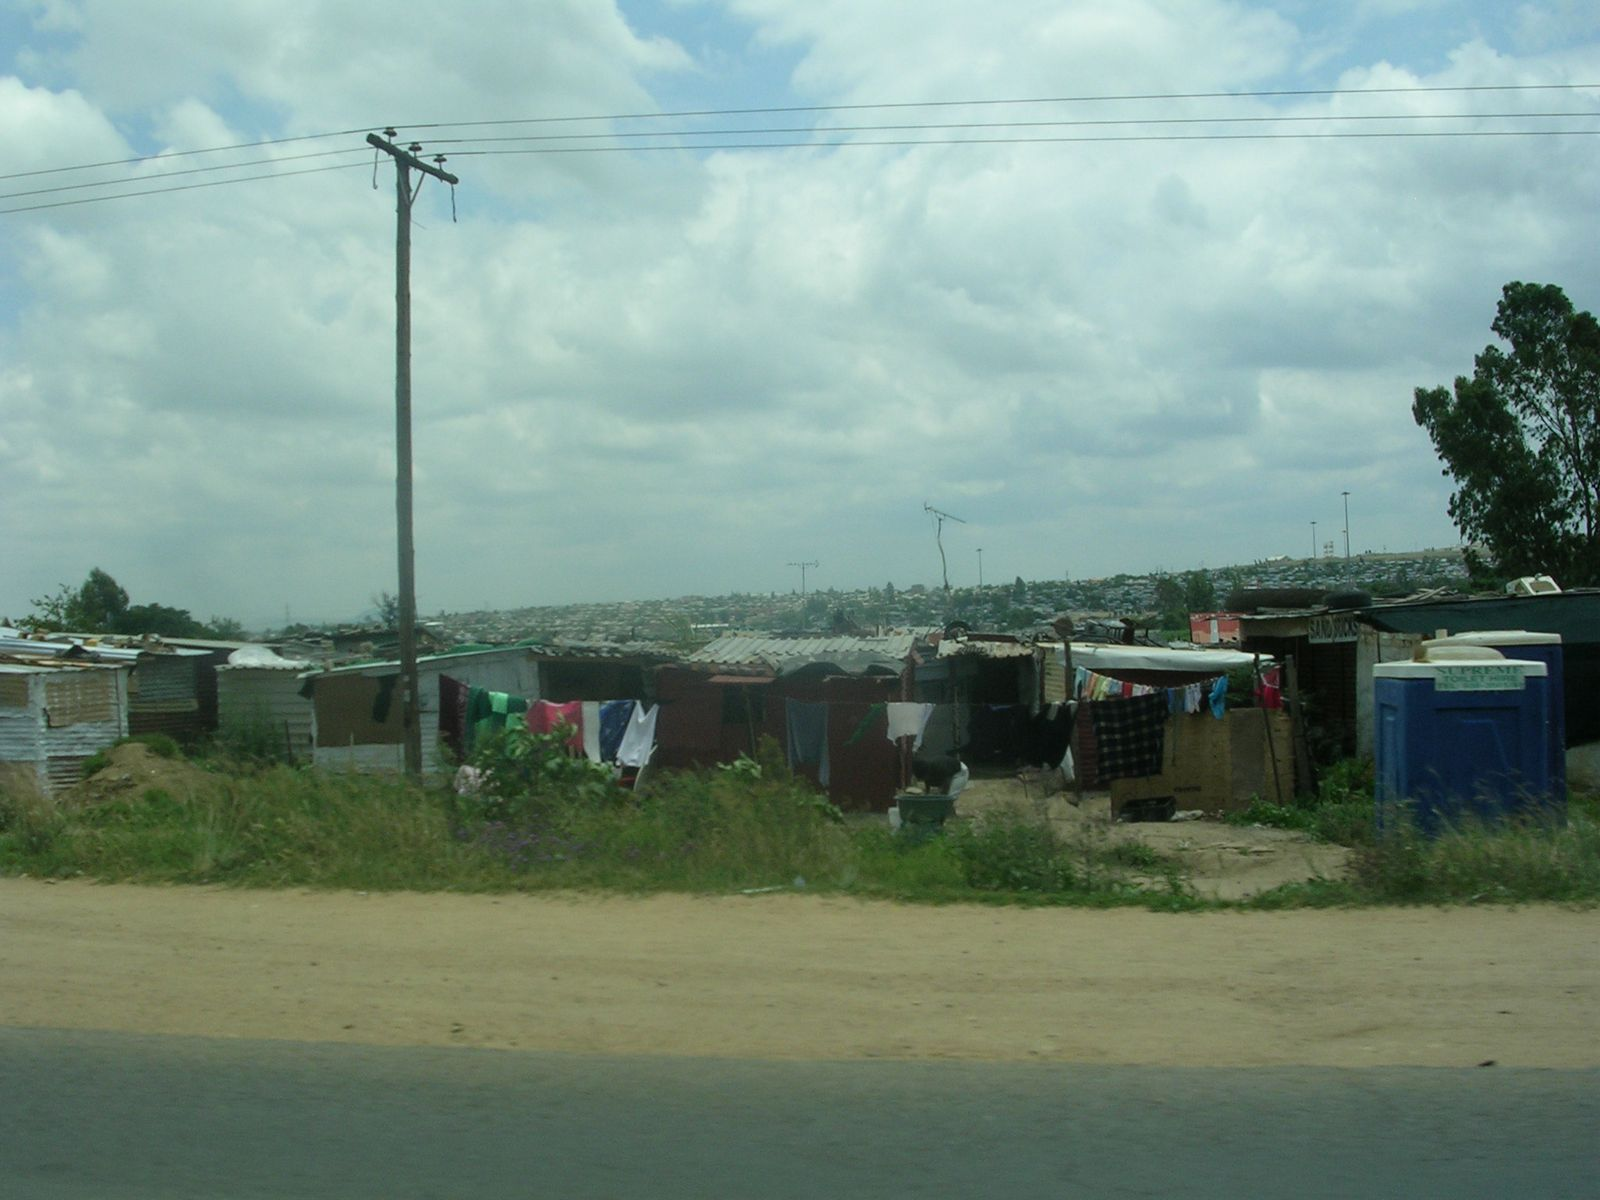 http://upload.wikimedia.org/wikipedia/commons/4/49/Diepsloot_Township%2C_Diepsloot%2C_Gauteng_Province.jpg